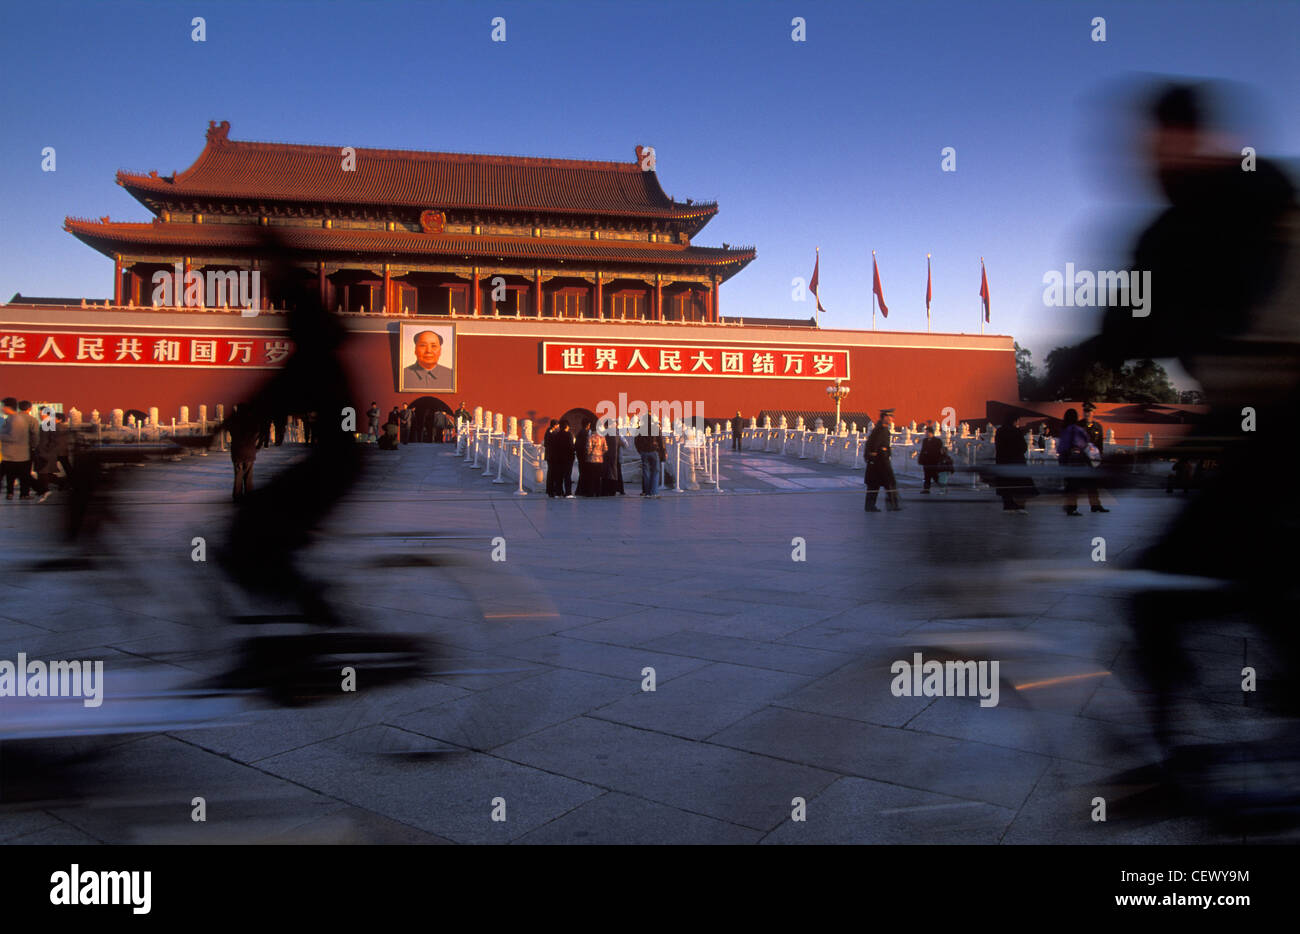 Radfahrer, Tian'anmen Tor, Tiananmen Square, Beijing, China Stockbild